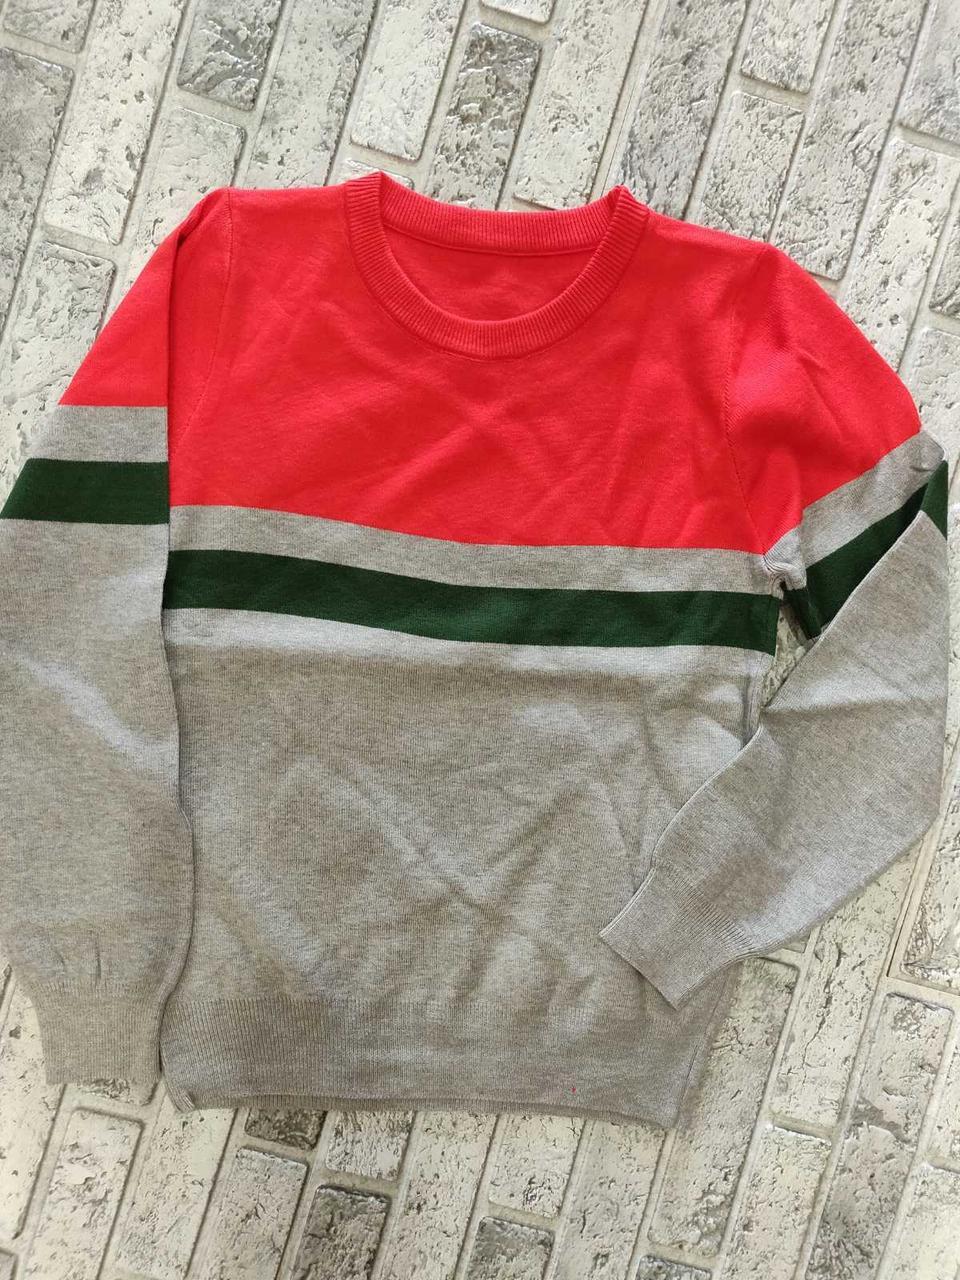 Яркий женский свитер спортивного стиля (42-44)